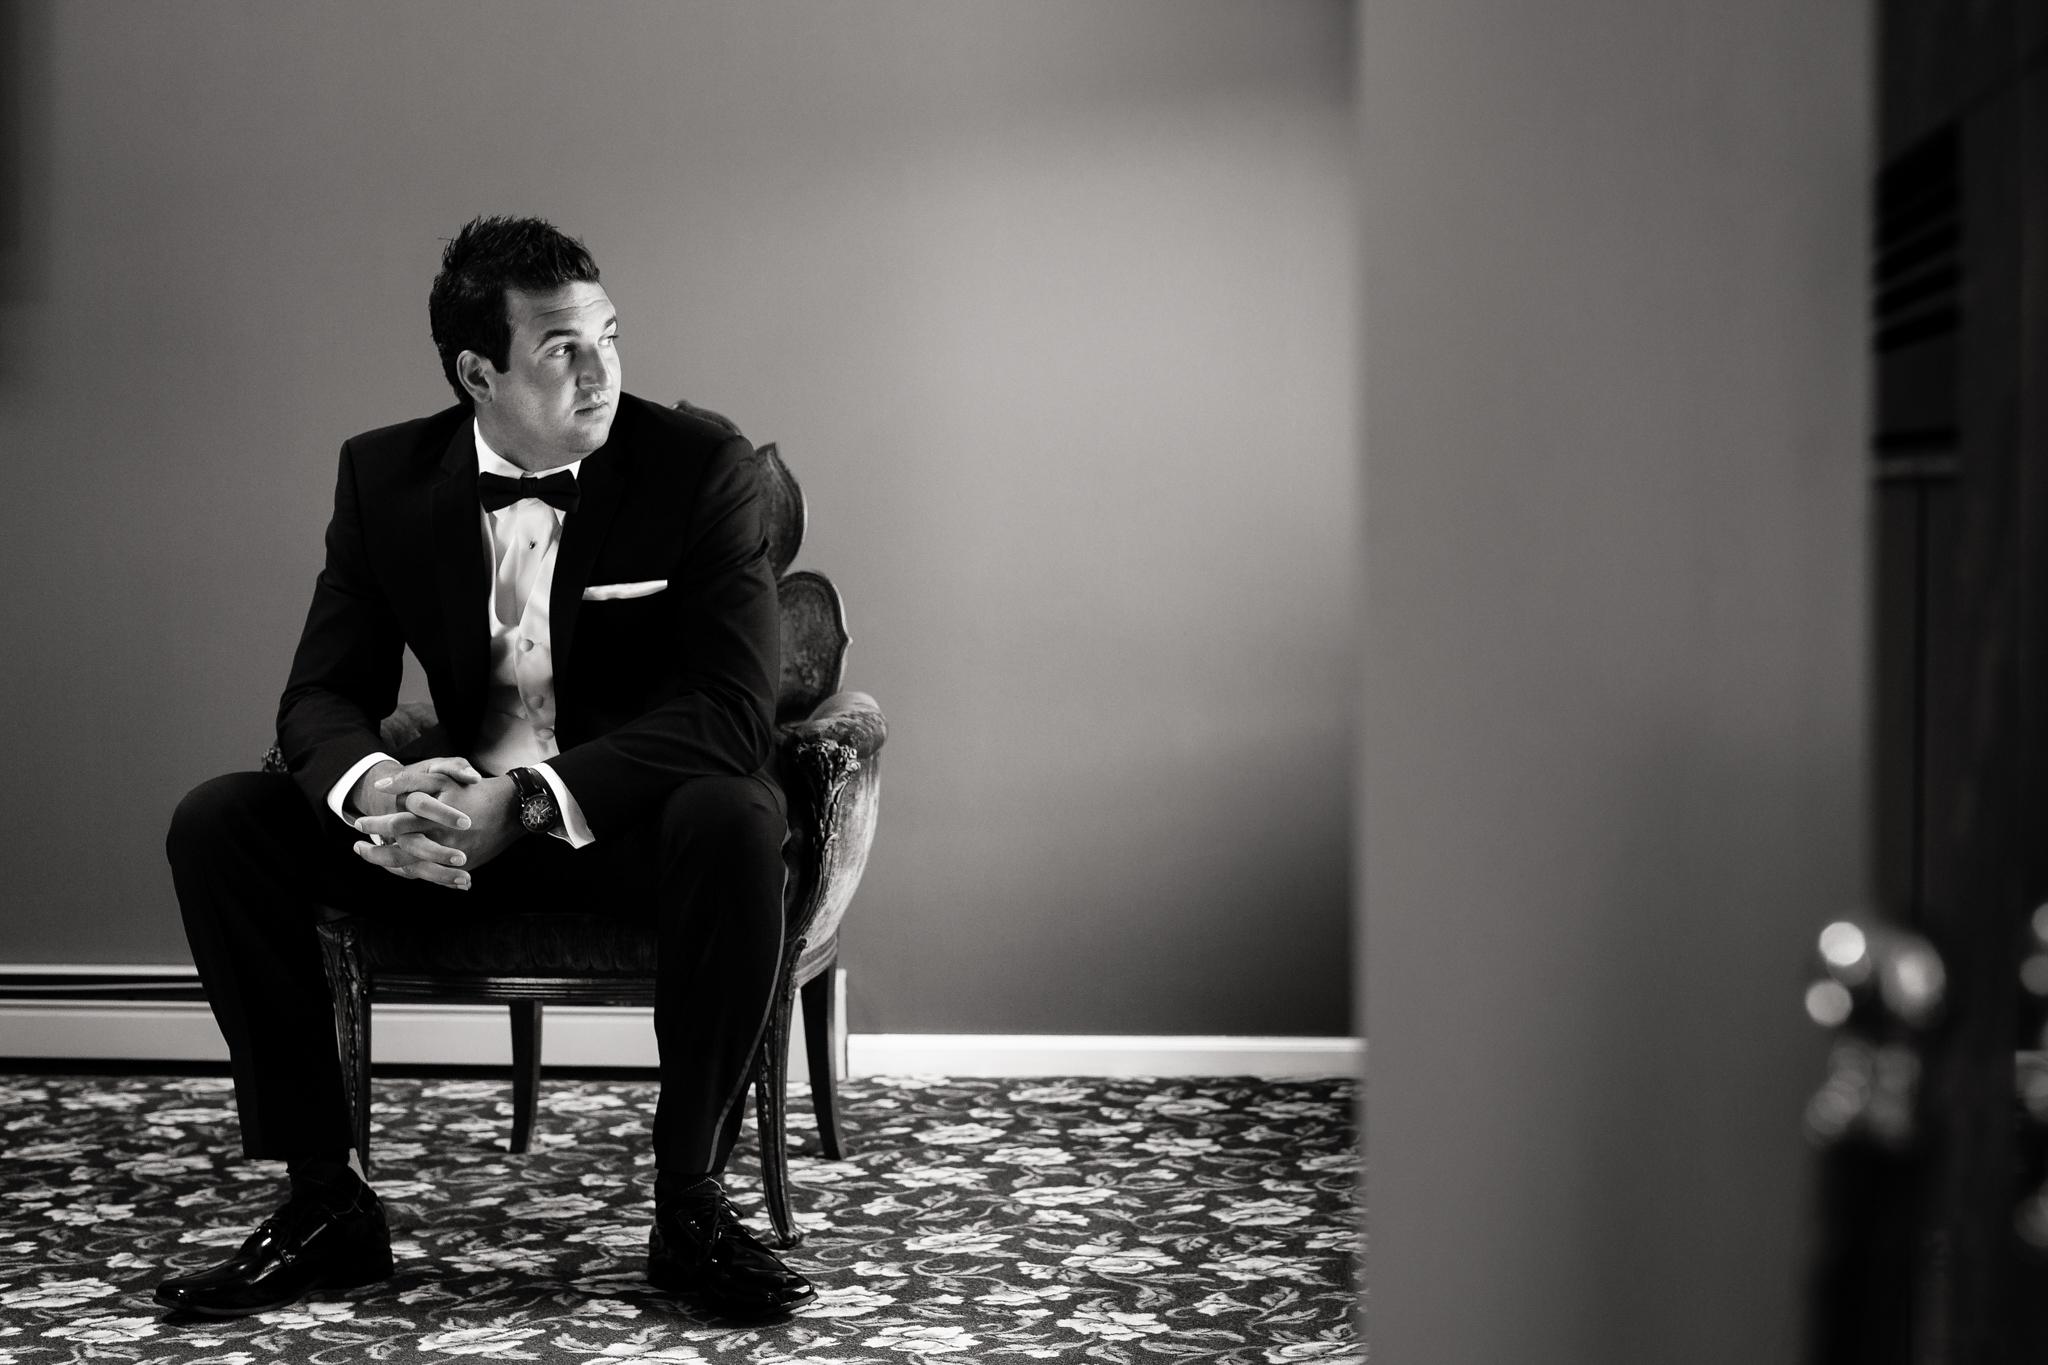 Statler-City-Buffalo-wedding-photographer- 0117bw.jpg